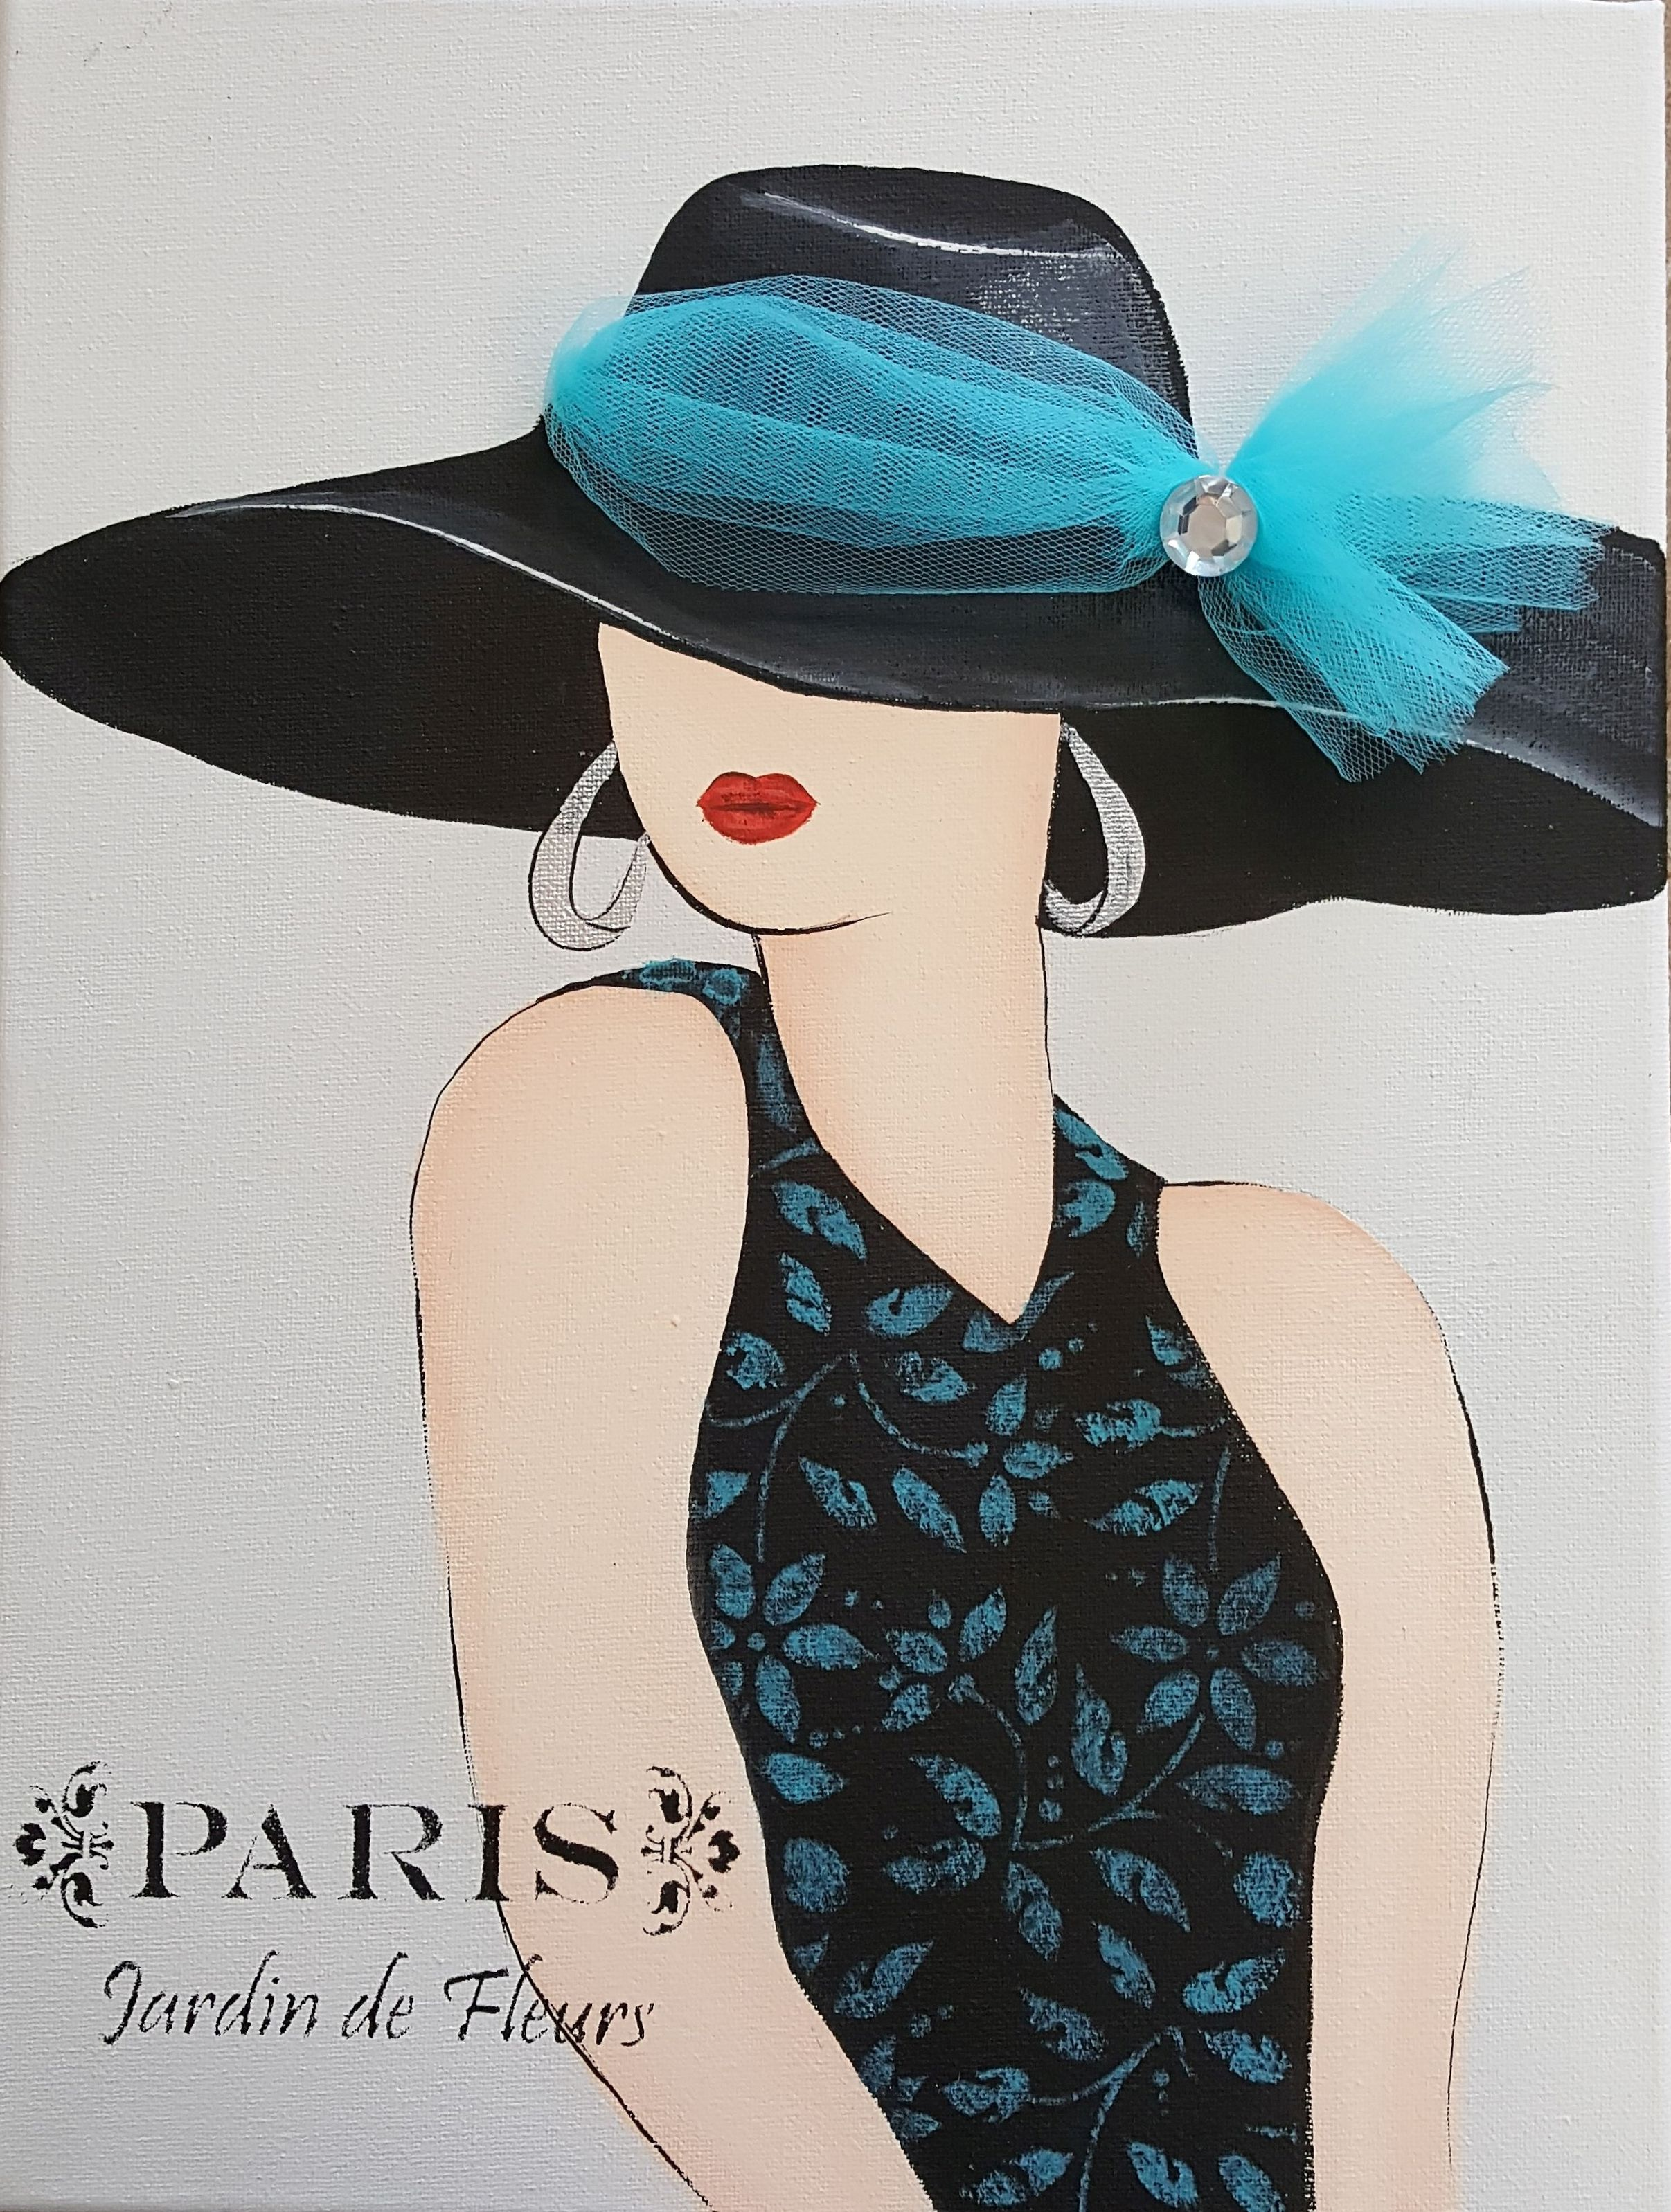 wfaa292-paris-girl-turquoise-pi.jpg